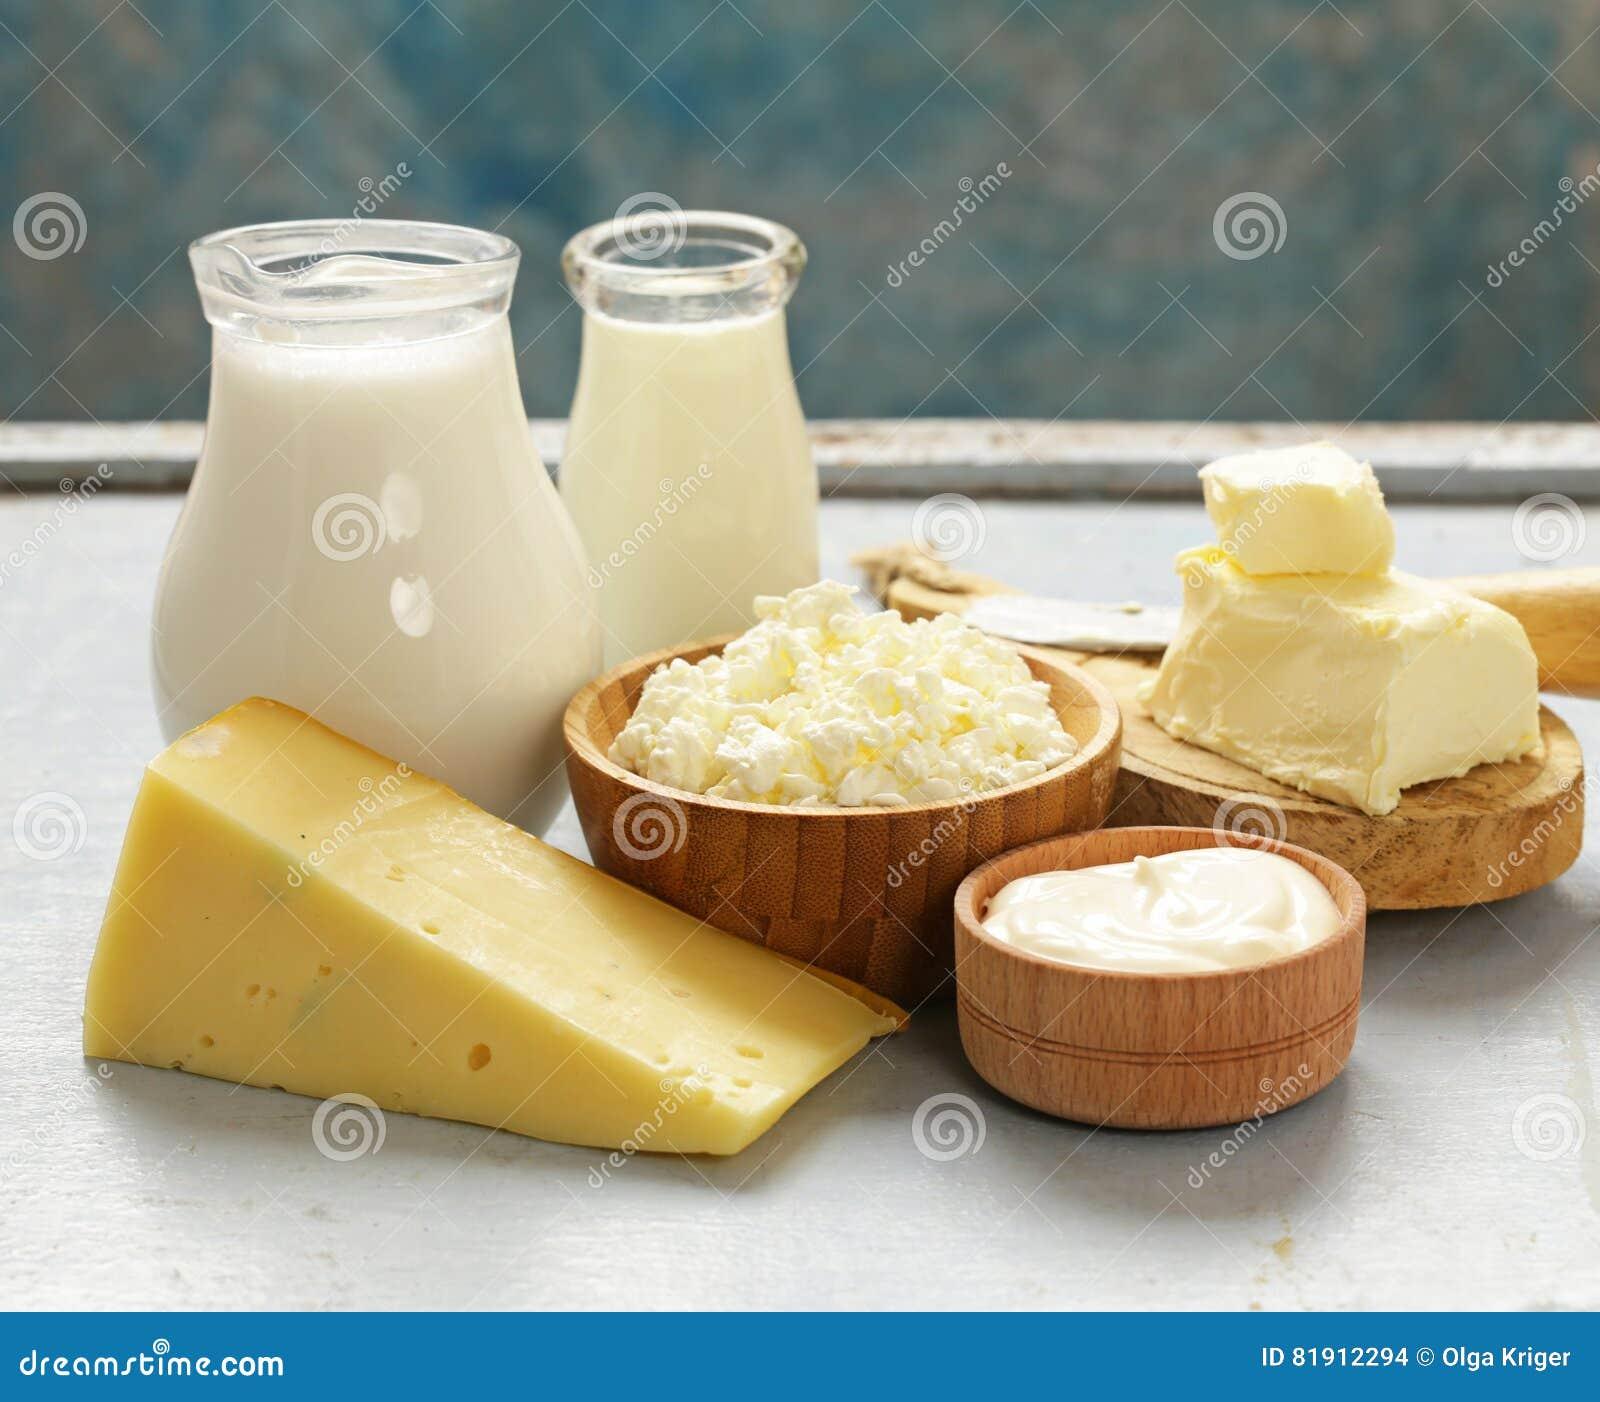 Sortierte Milchprodukte melken, Jogurt, Hüttenkäse, Sauerrahm